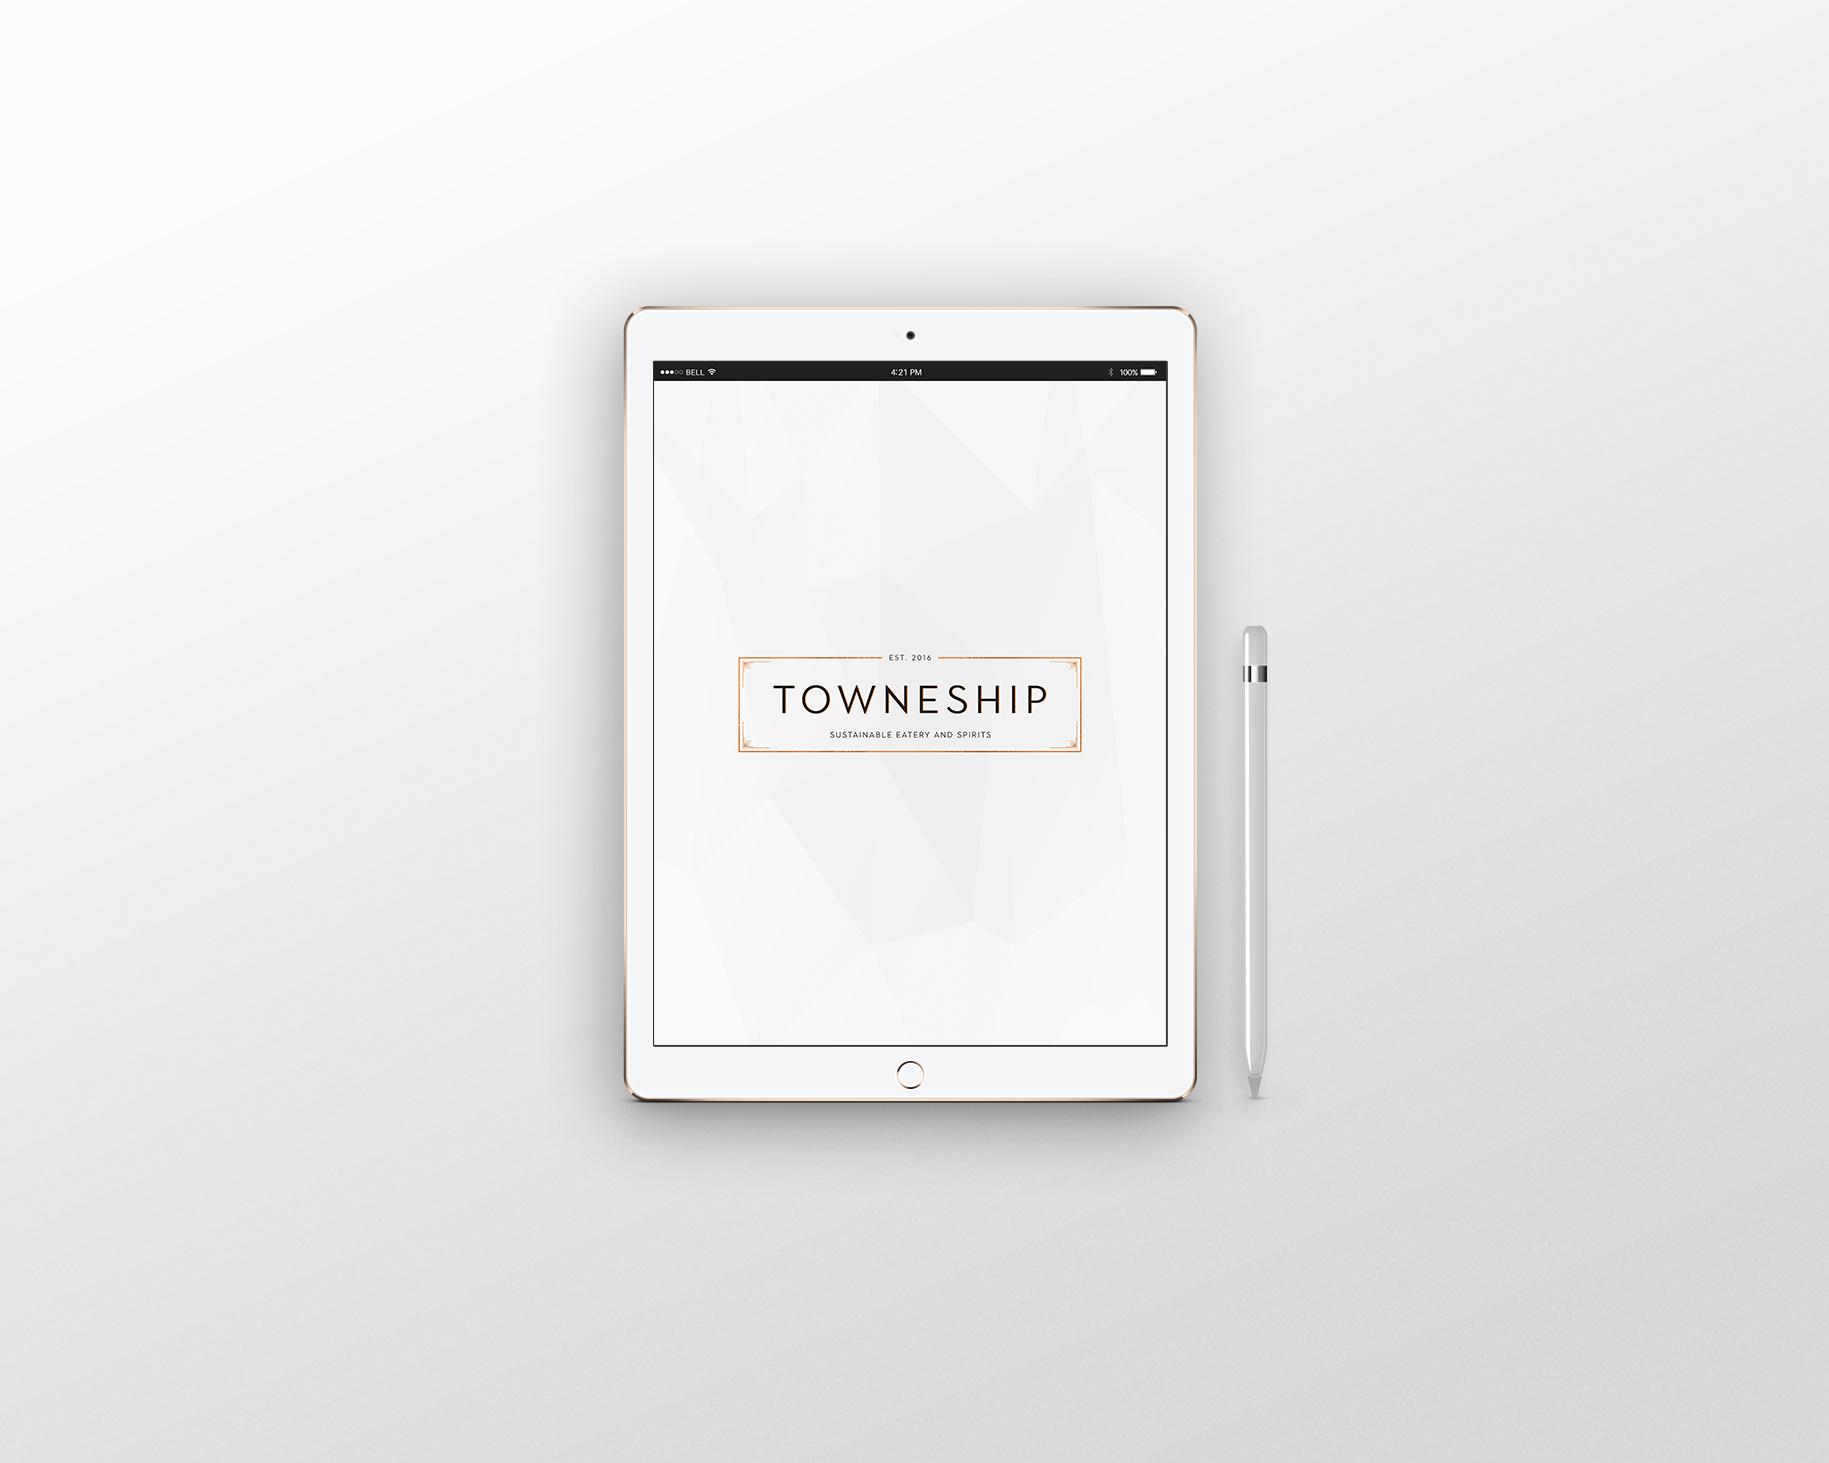 Restaurant and Hospitality Logo Design Services